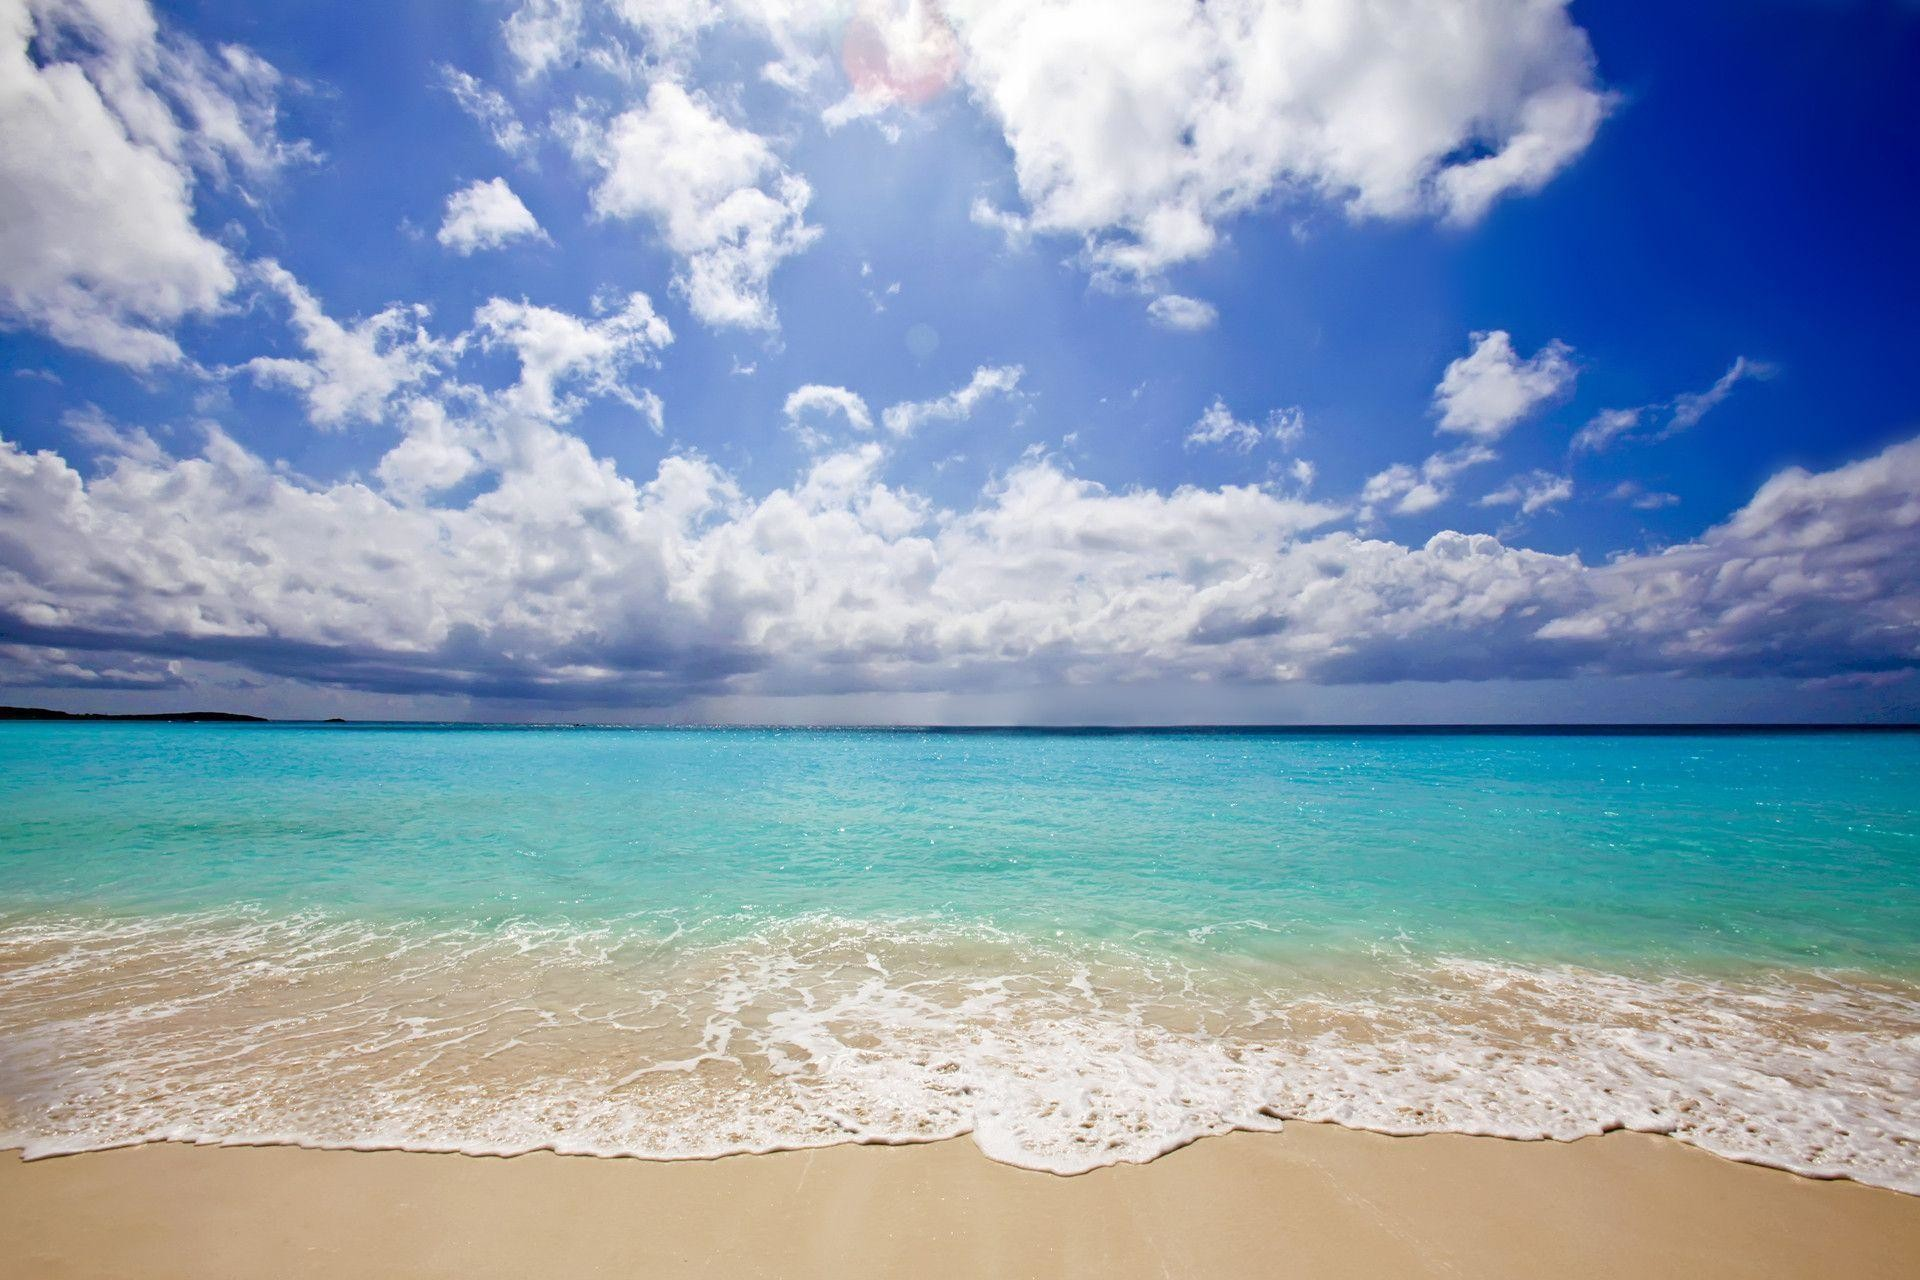 caribbean beach wallpaper HD by venomxbaby on DeviantArt